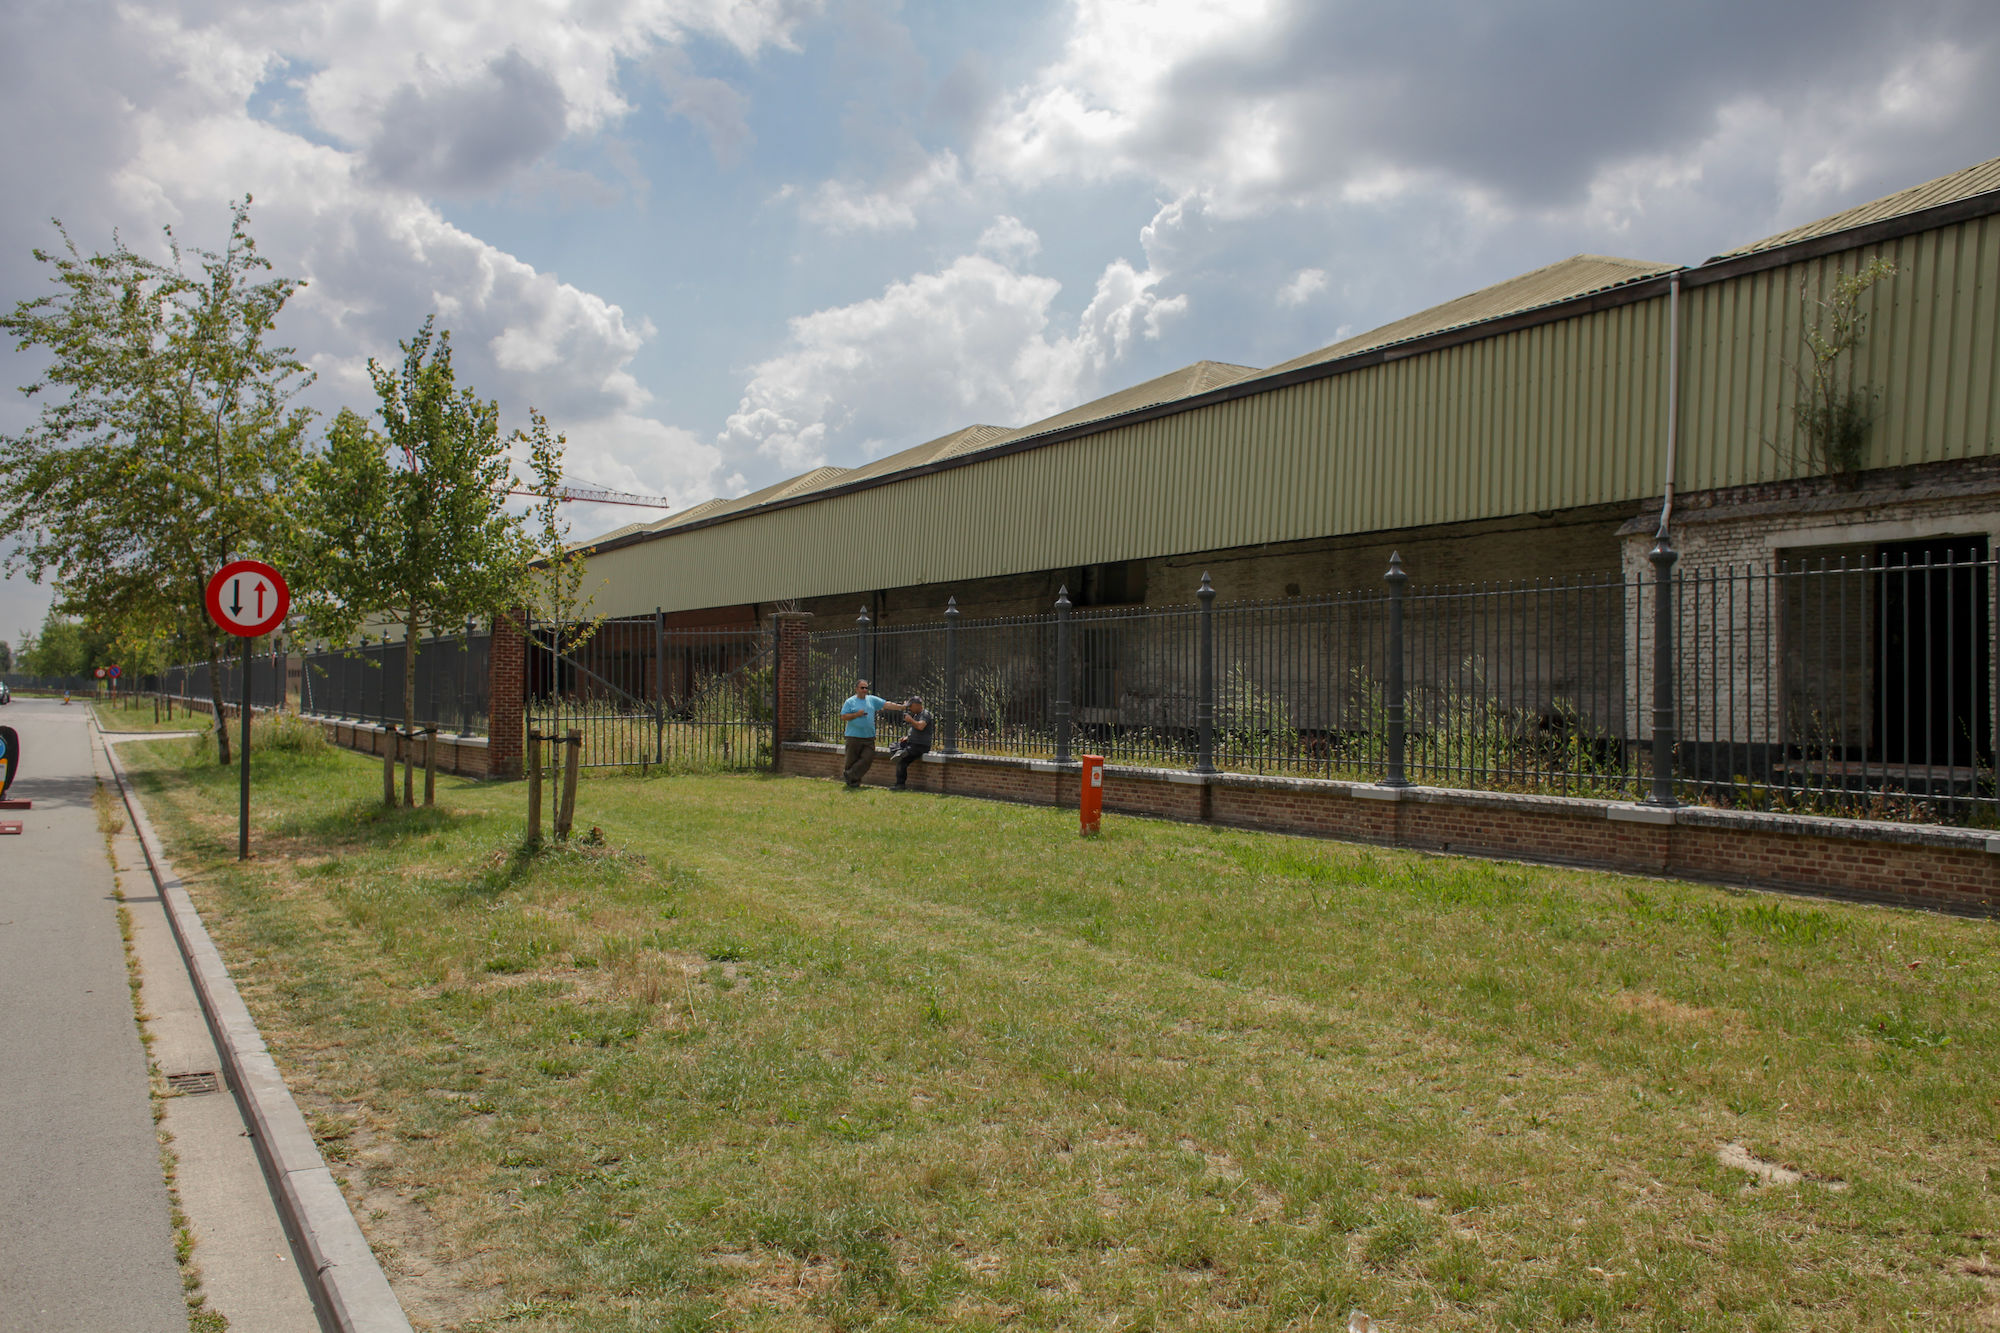 2019-07-02 Muide Meulestede prospectie Wannes_stadsvernieuwing_IMG_0391-2.jpg